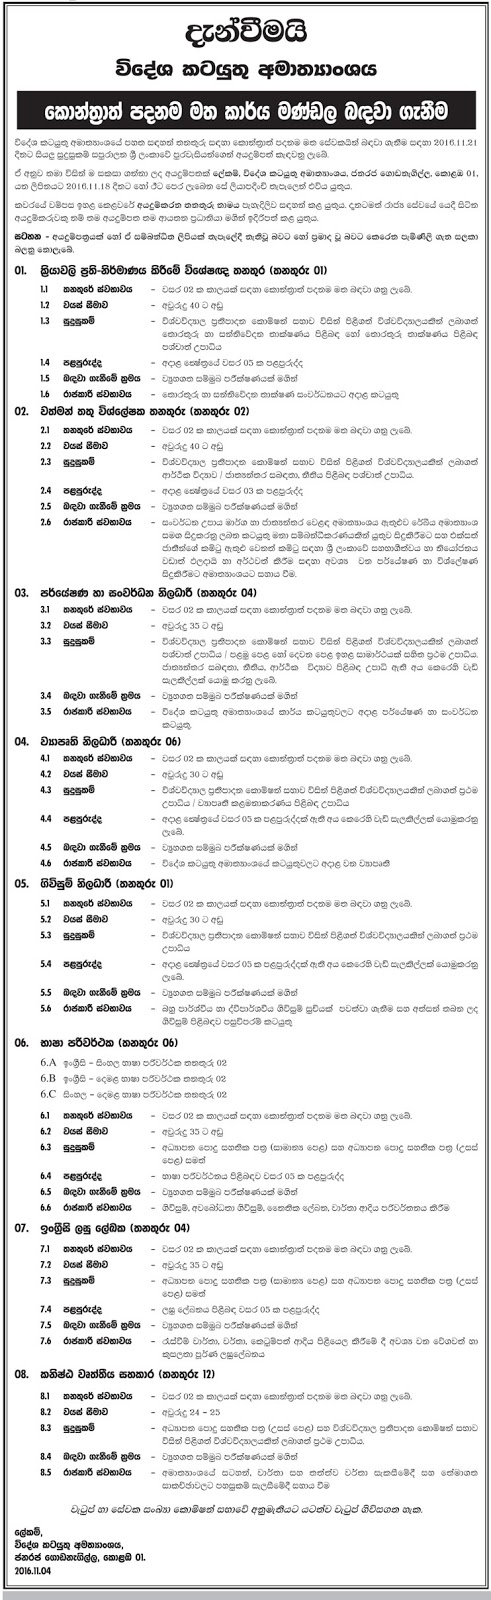 Sri Lankan Government Job Vacancies at Ministry of Foreign Affairs. විදේශ කටයුතු අමාත්යංශයේ නව ඇබෑර්තු.